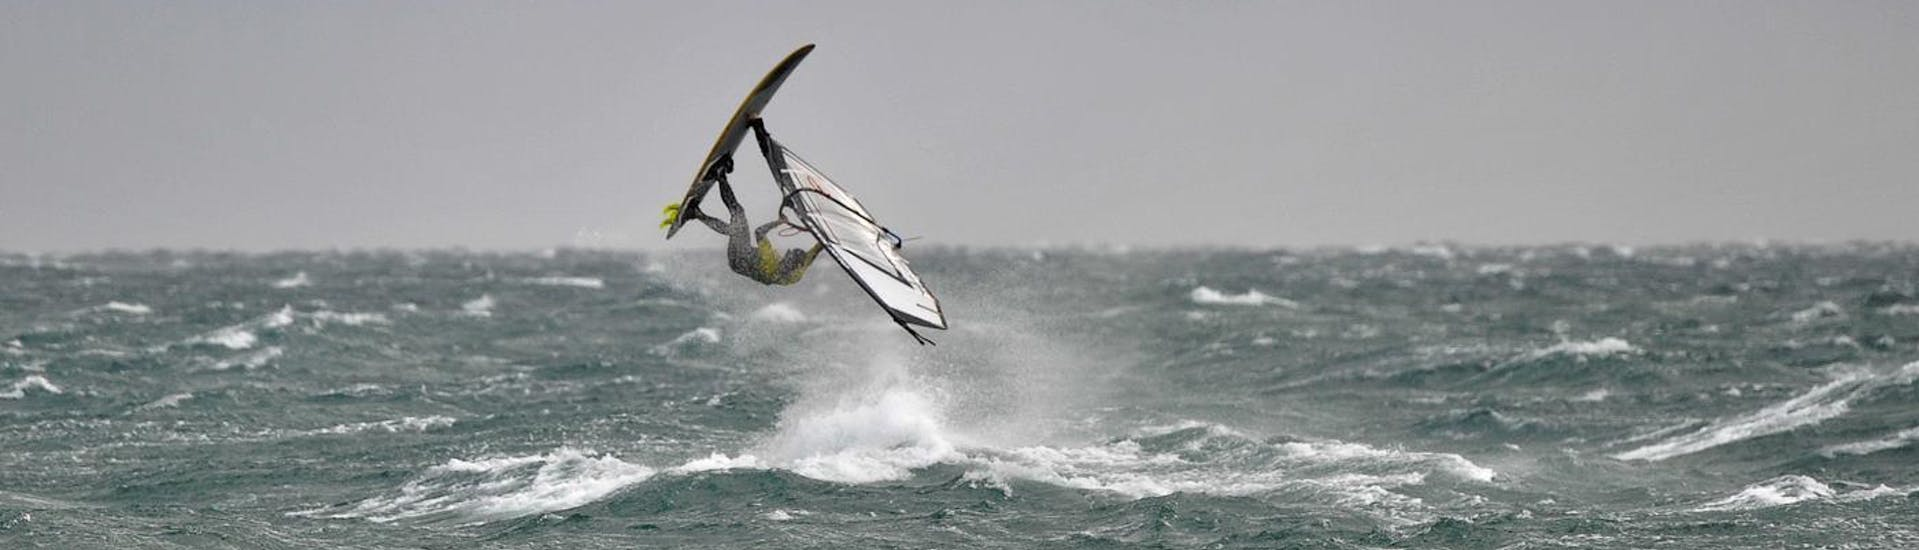 Windsurfing Lessons at Školjić Beach for Experts